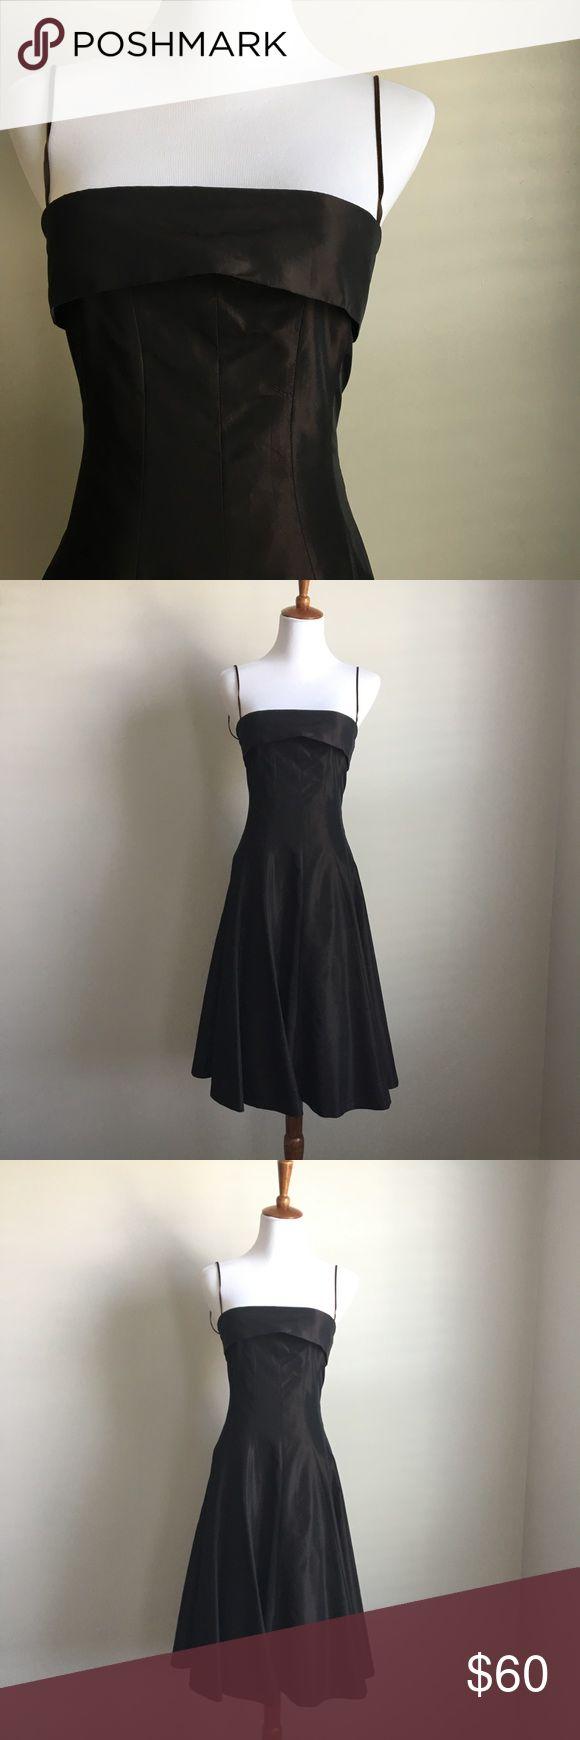 🎒WKND SALE🎒 NWOT Zara Dress Beautiful A line Dress. Espresso dress. Never used. Zara Dresses Midi